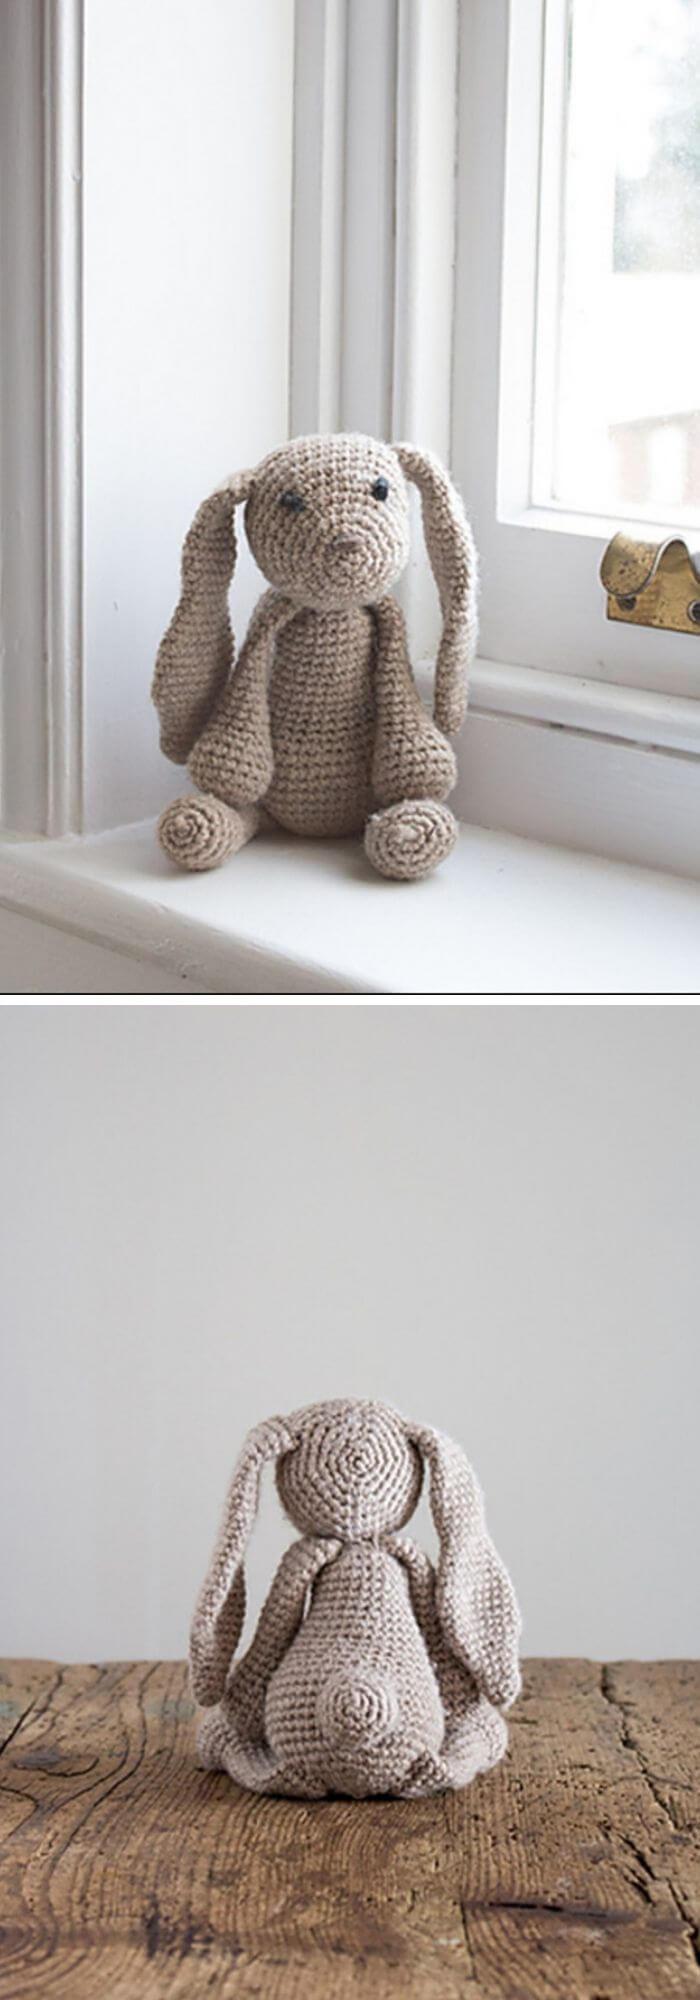 Crochet Kit - Bunny Family,Amigurumi Kit,Crochet Kit,Crochet ... | 2000x700